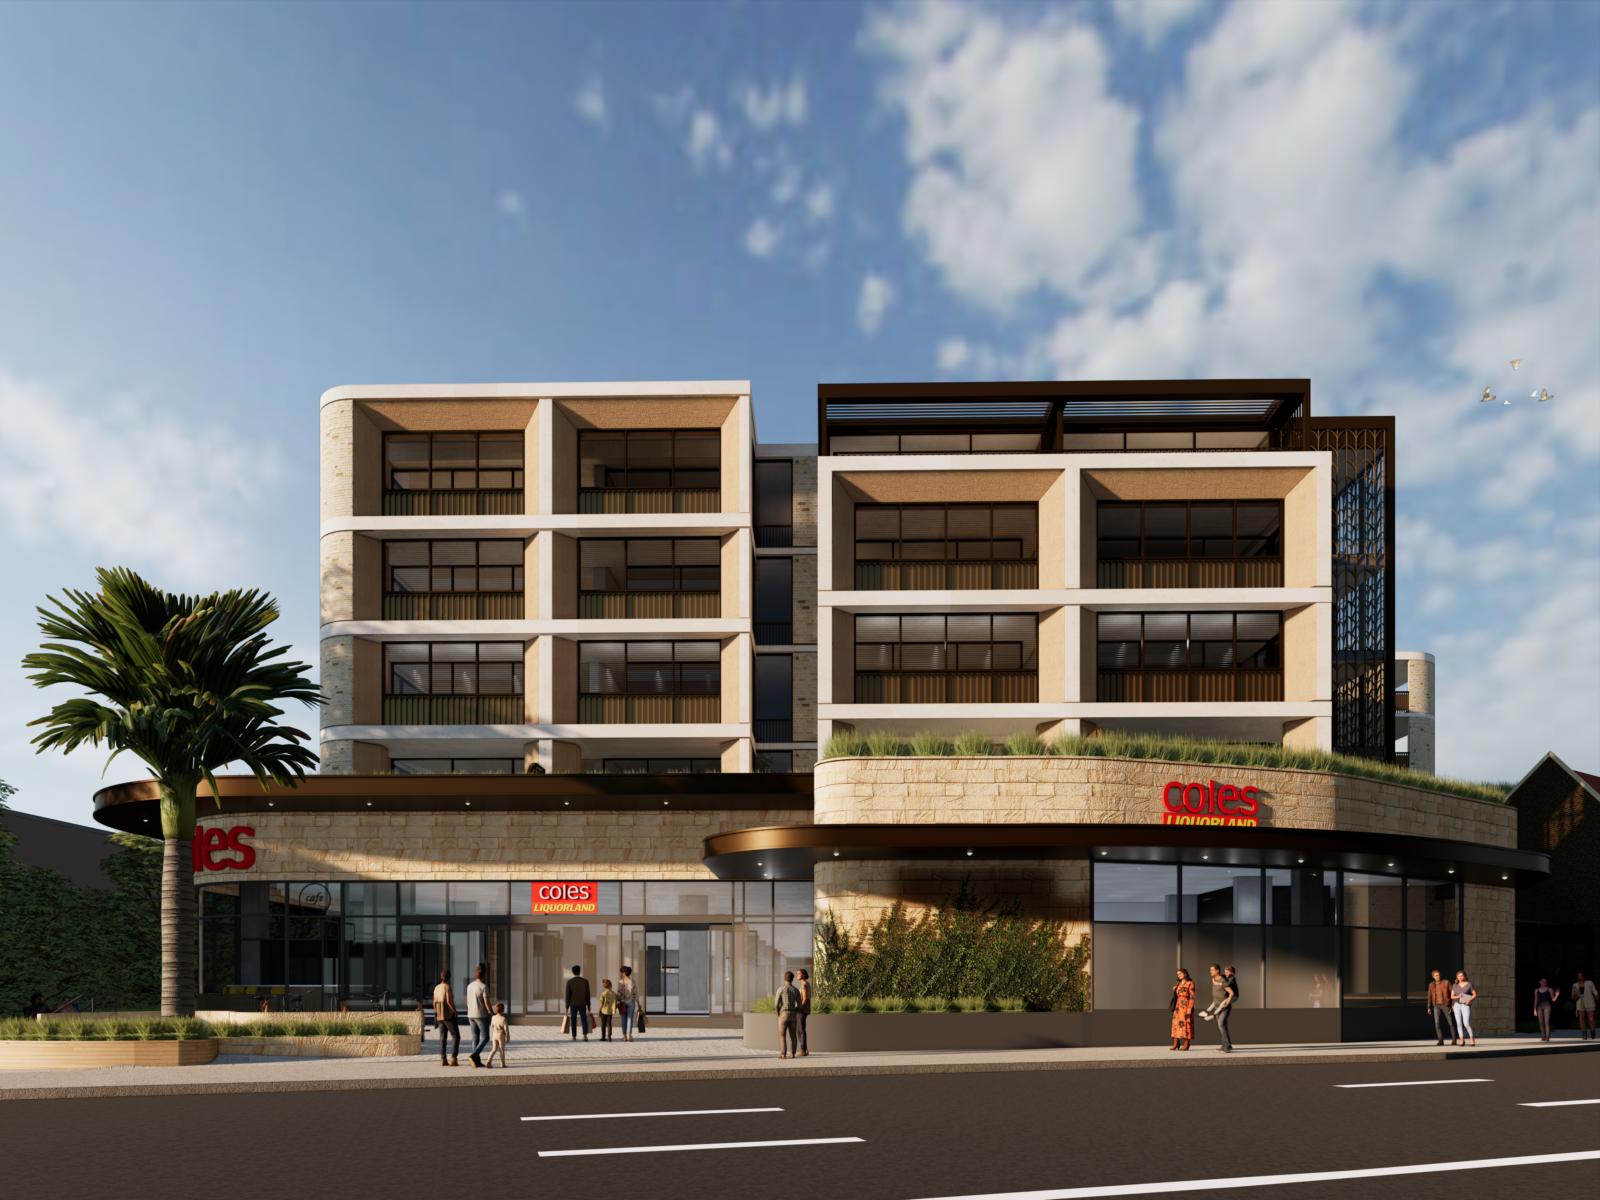 New Shop Top Plans for Sydney's North Shore